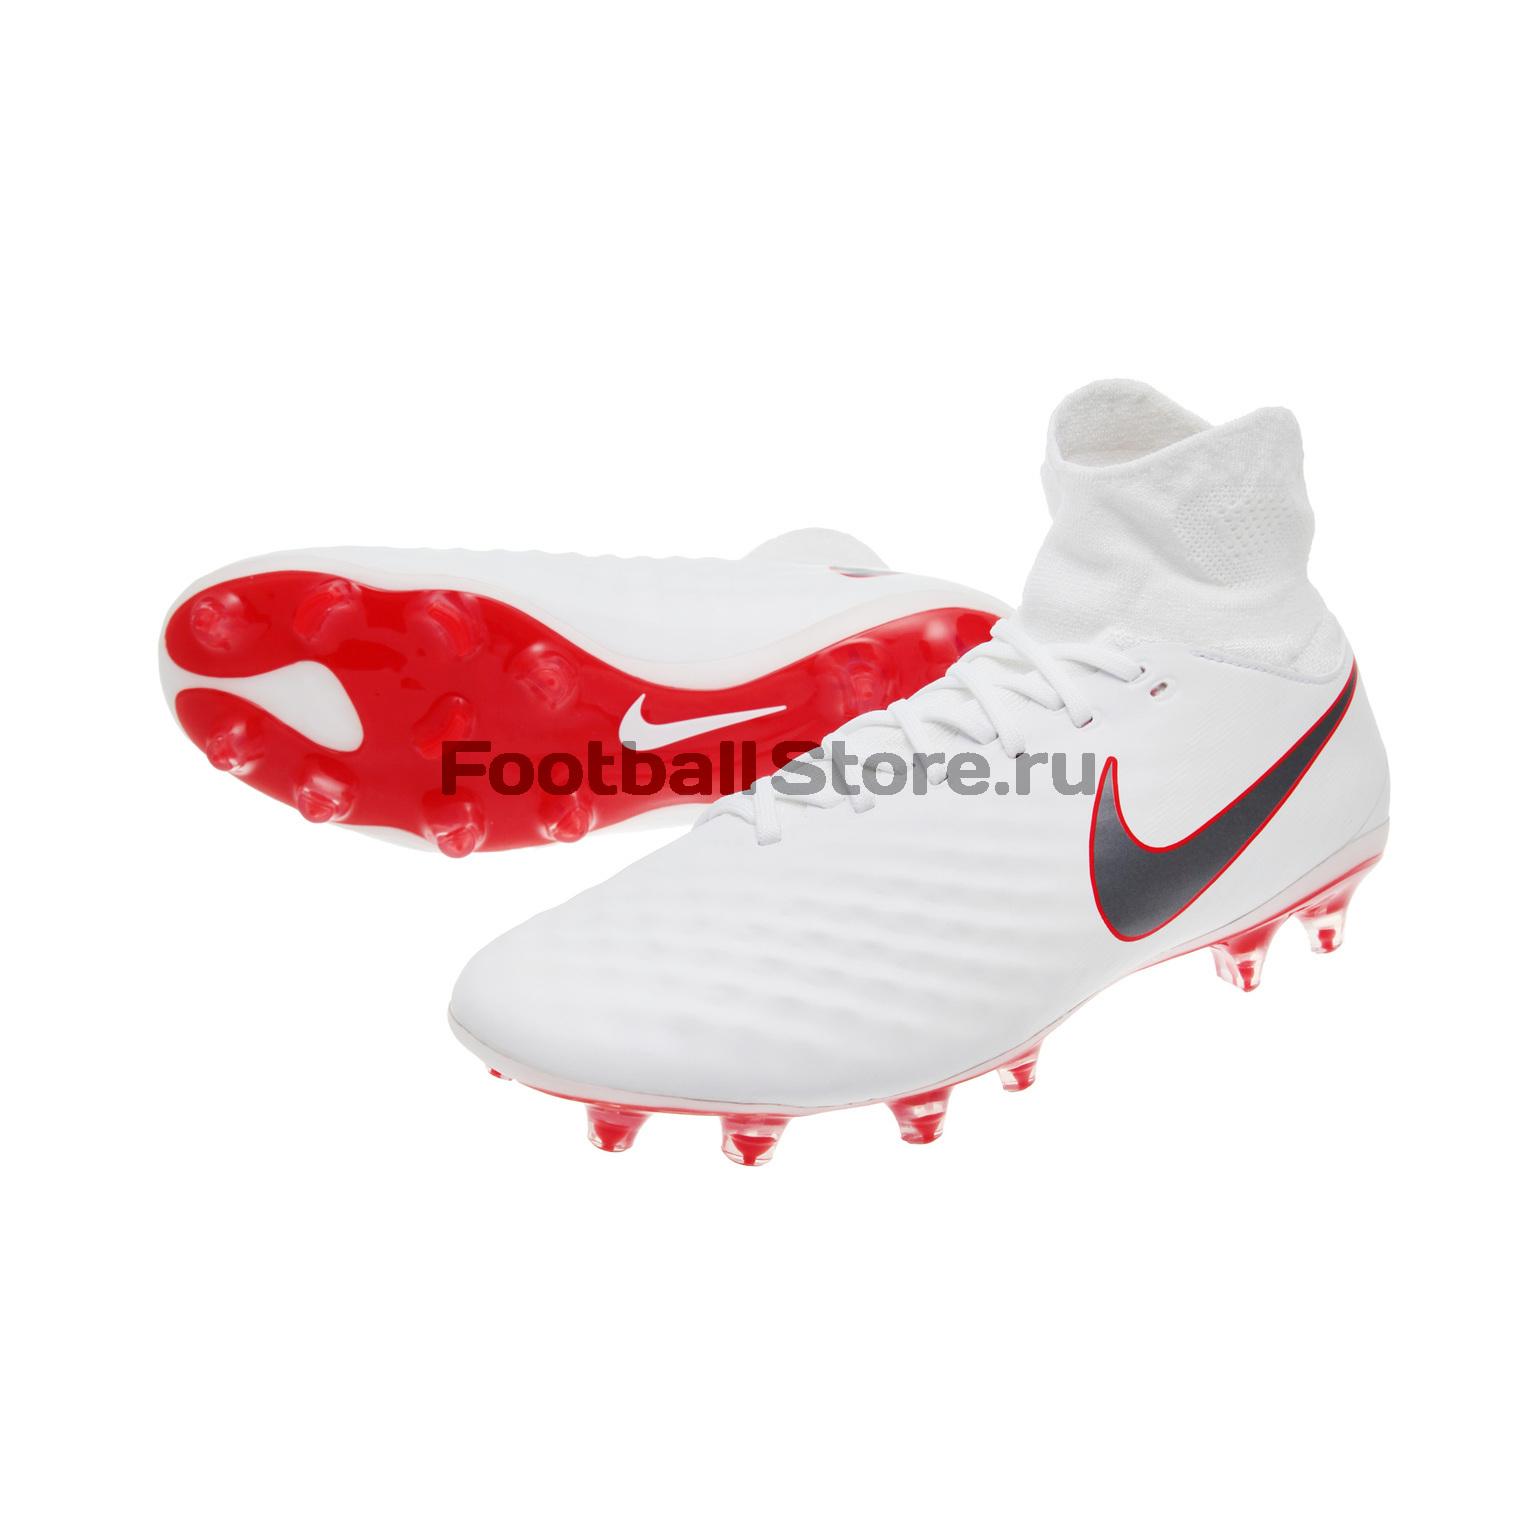 Бутсы Nike Magista Obra 2 Pro DF FG AH7308-107 бутсы nike jr obra 2 club fg ah7314 107